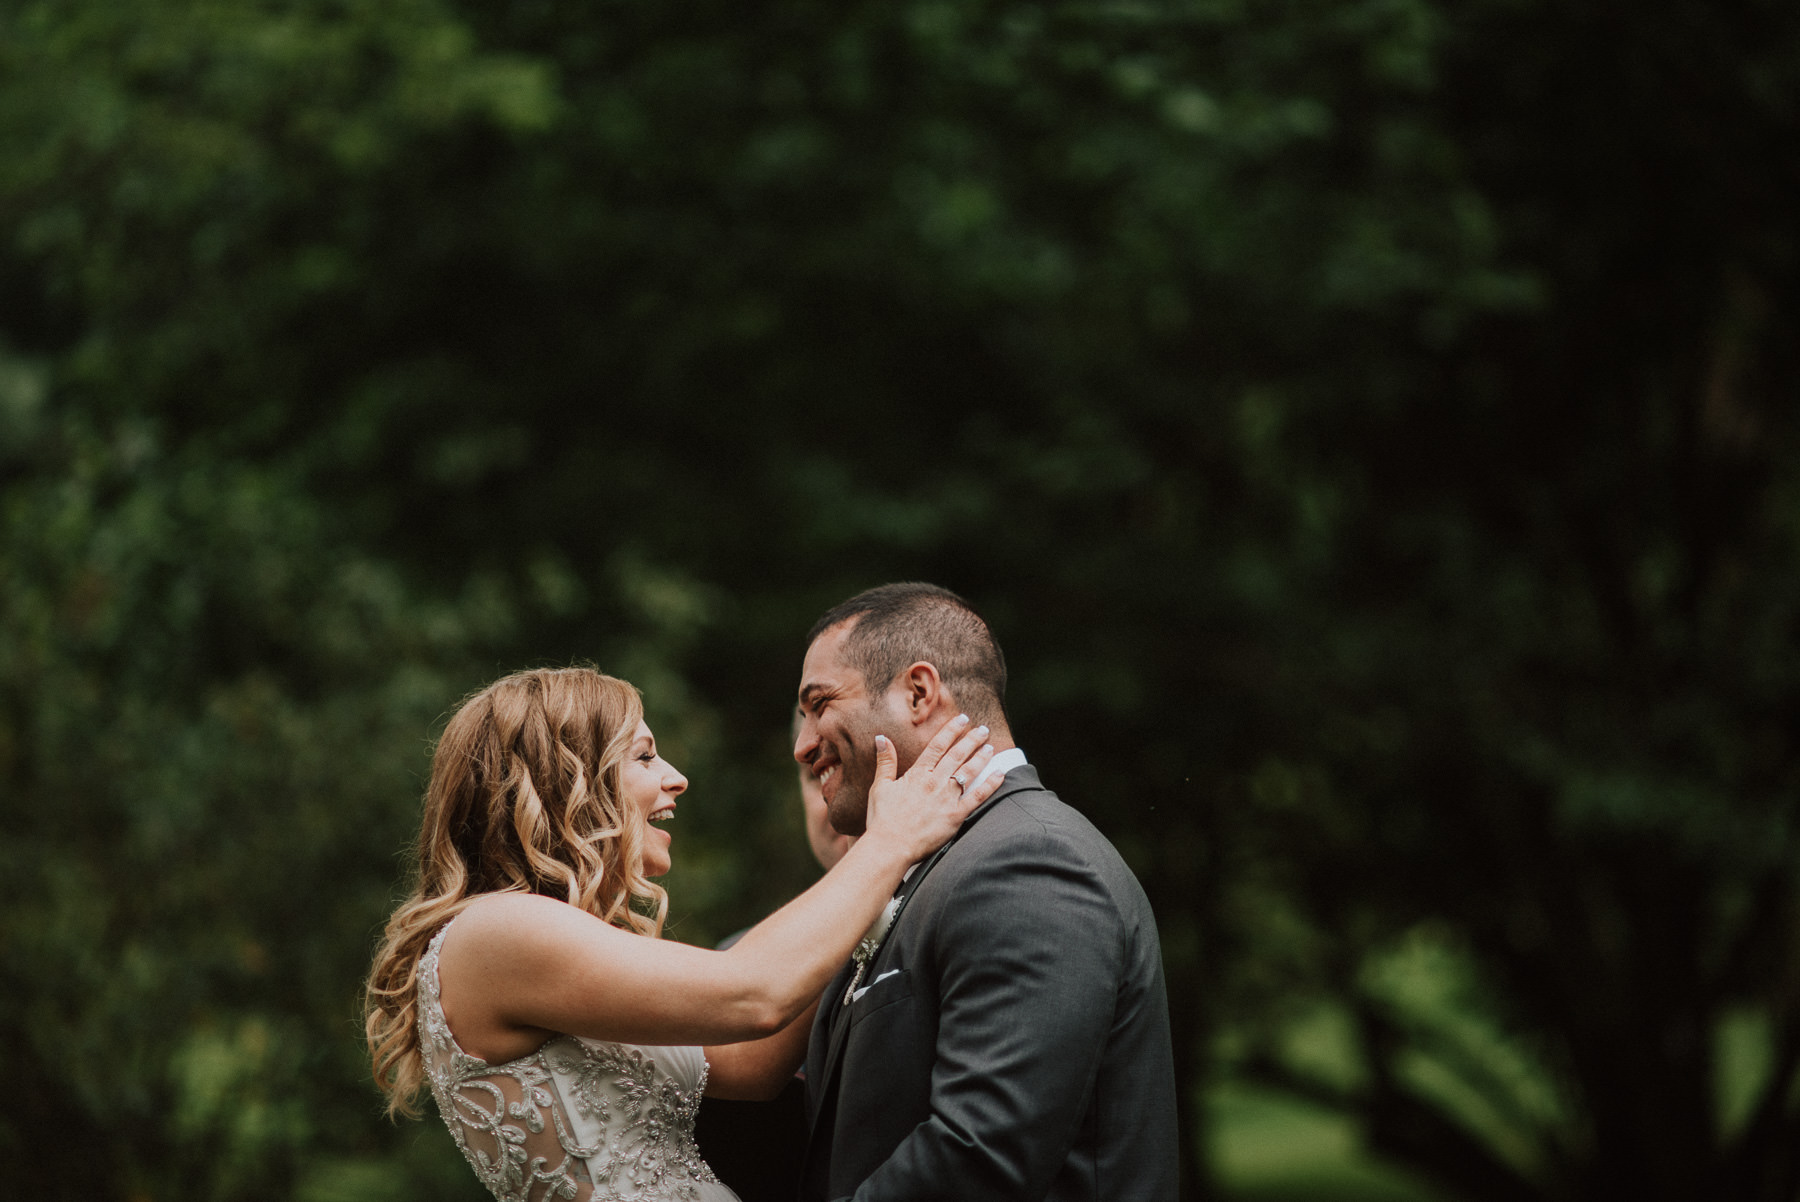 appleford-estate-wedding-photography-68.jpg